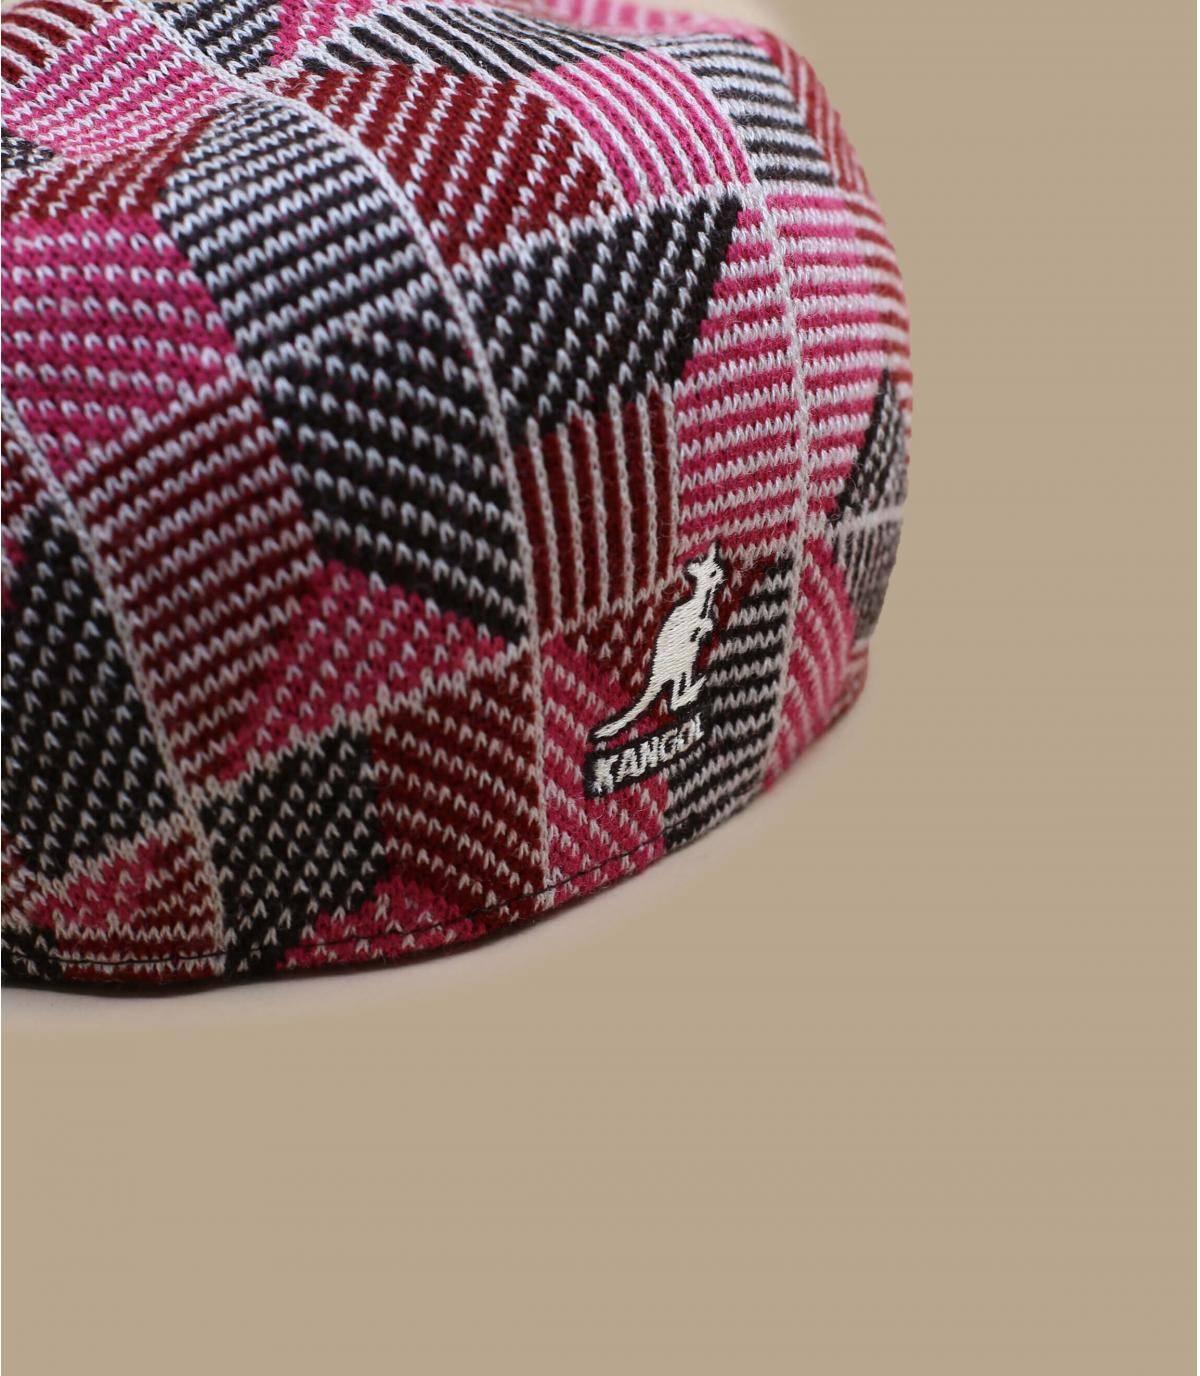 Détails 507 Tiled electric pink - image 3